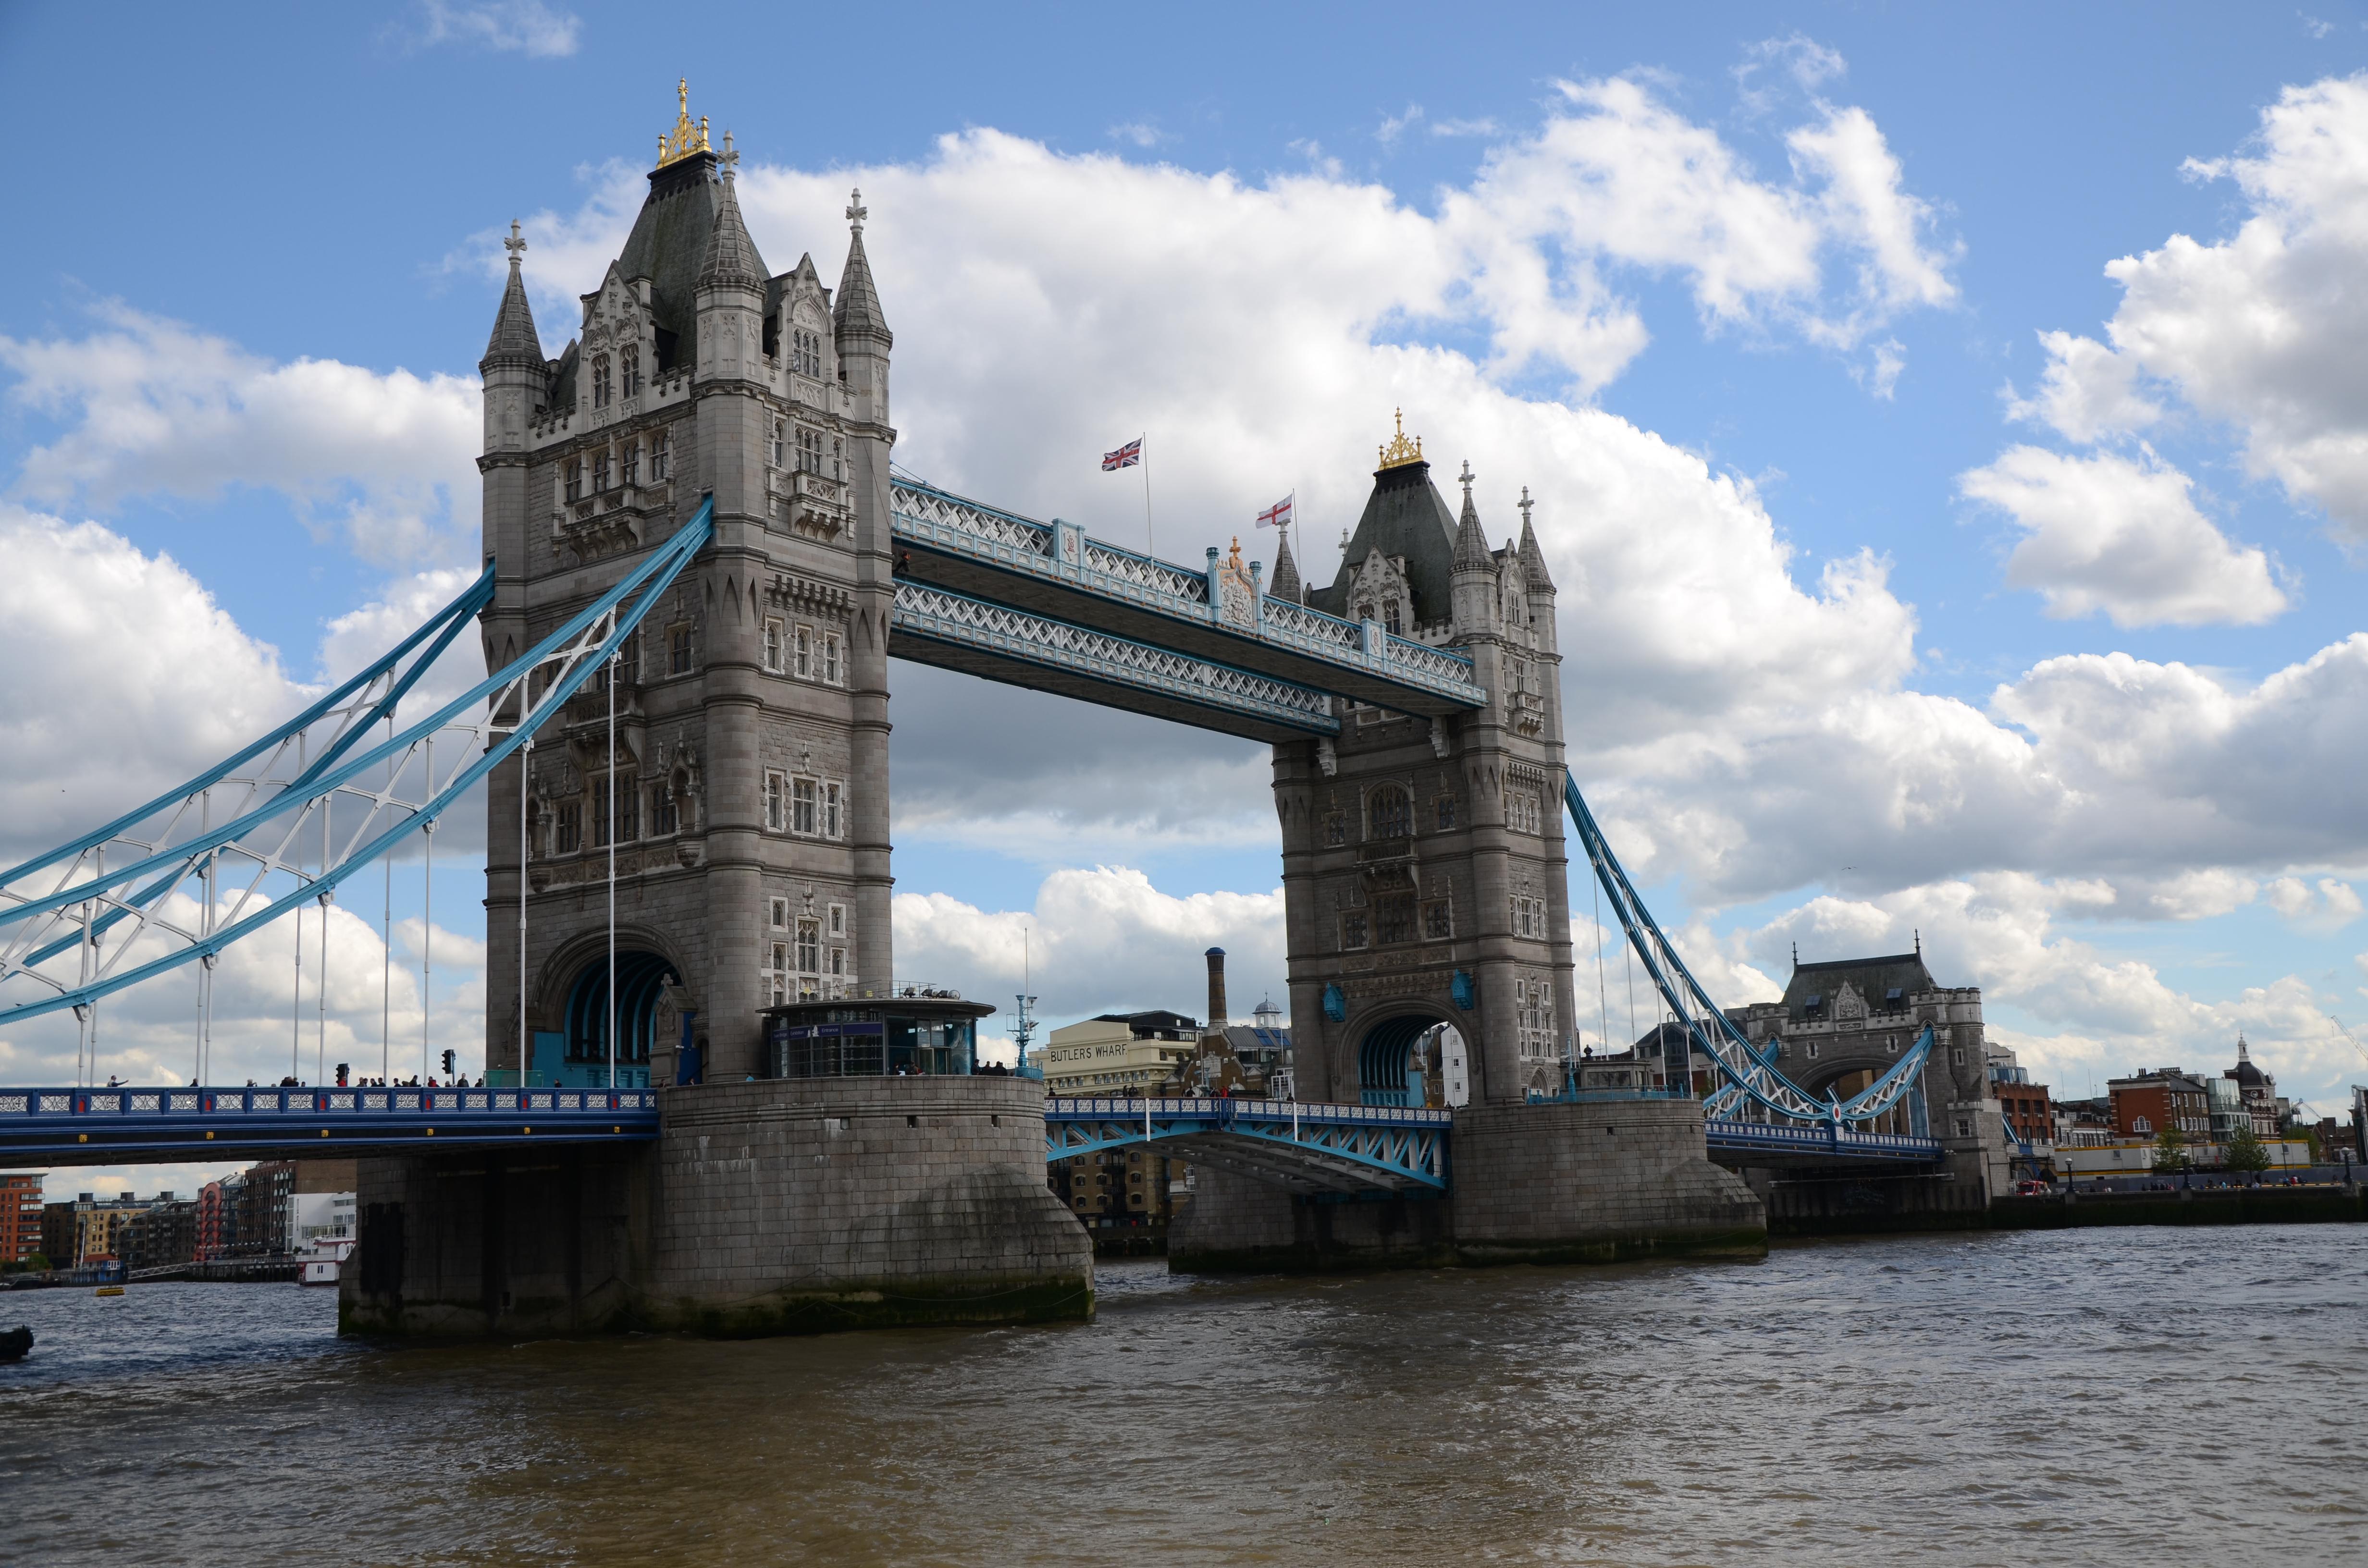 伦敦塔桥(tower bridge)